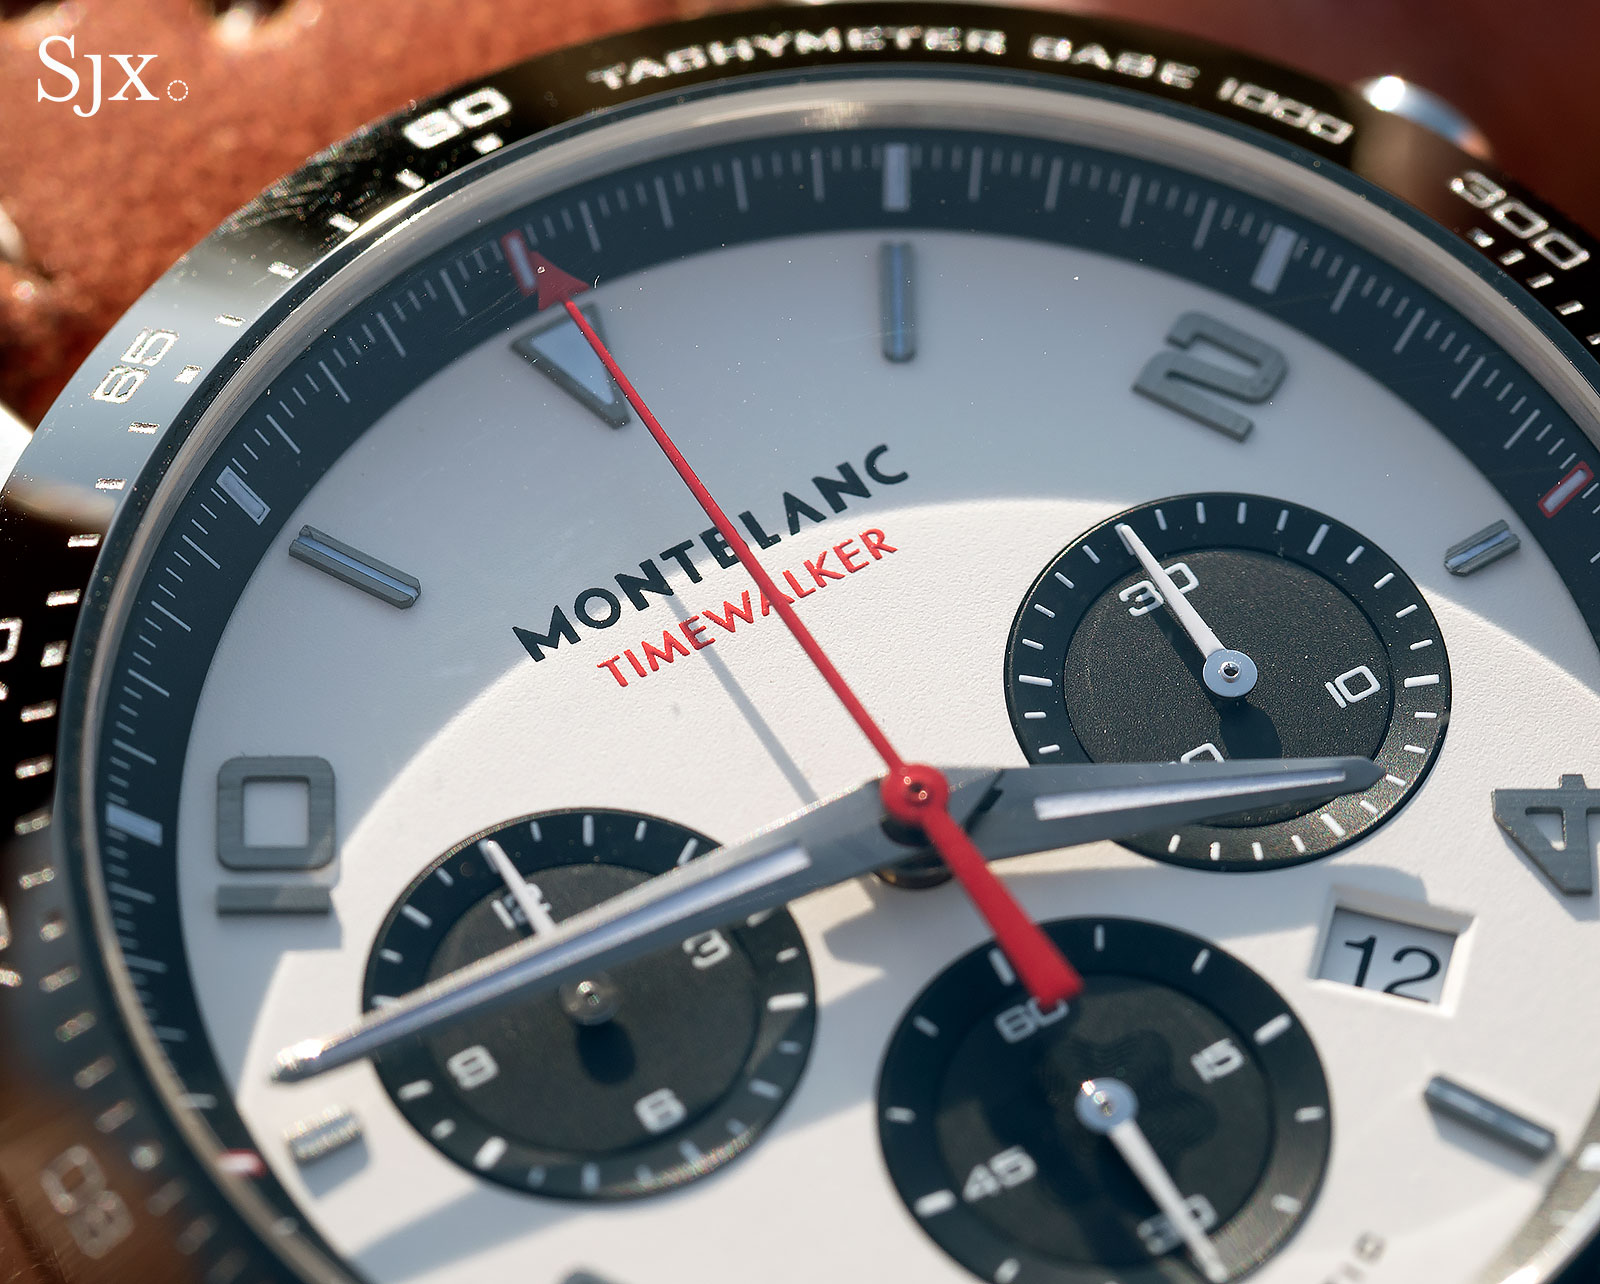 Montblanc Montblanc TimeWalker Manufacture Chronograph 3